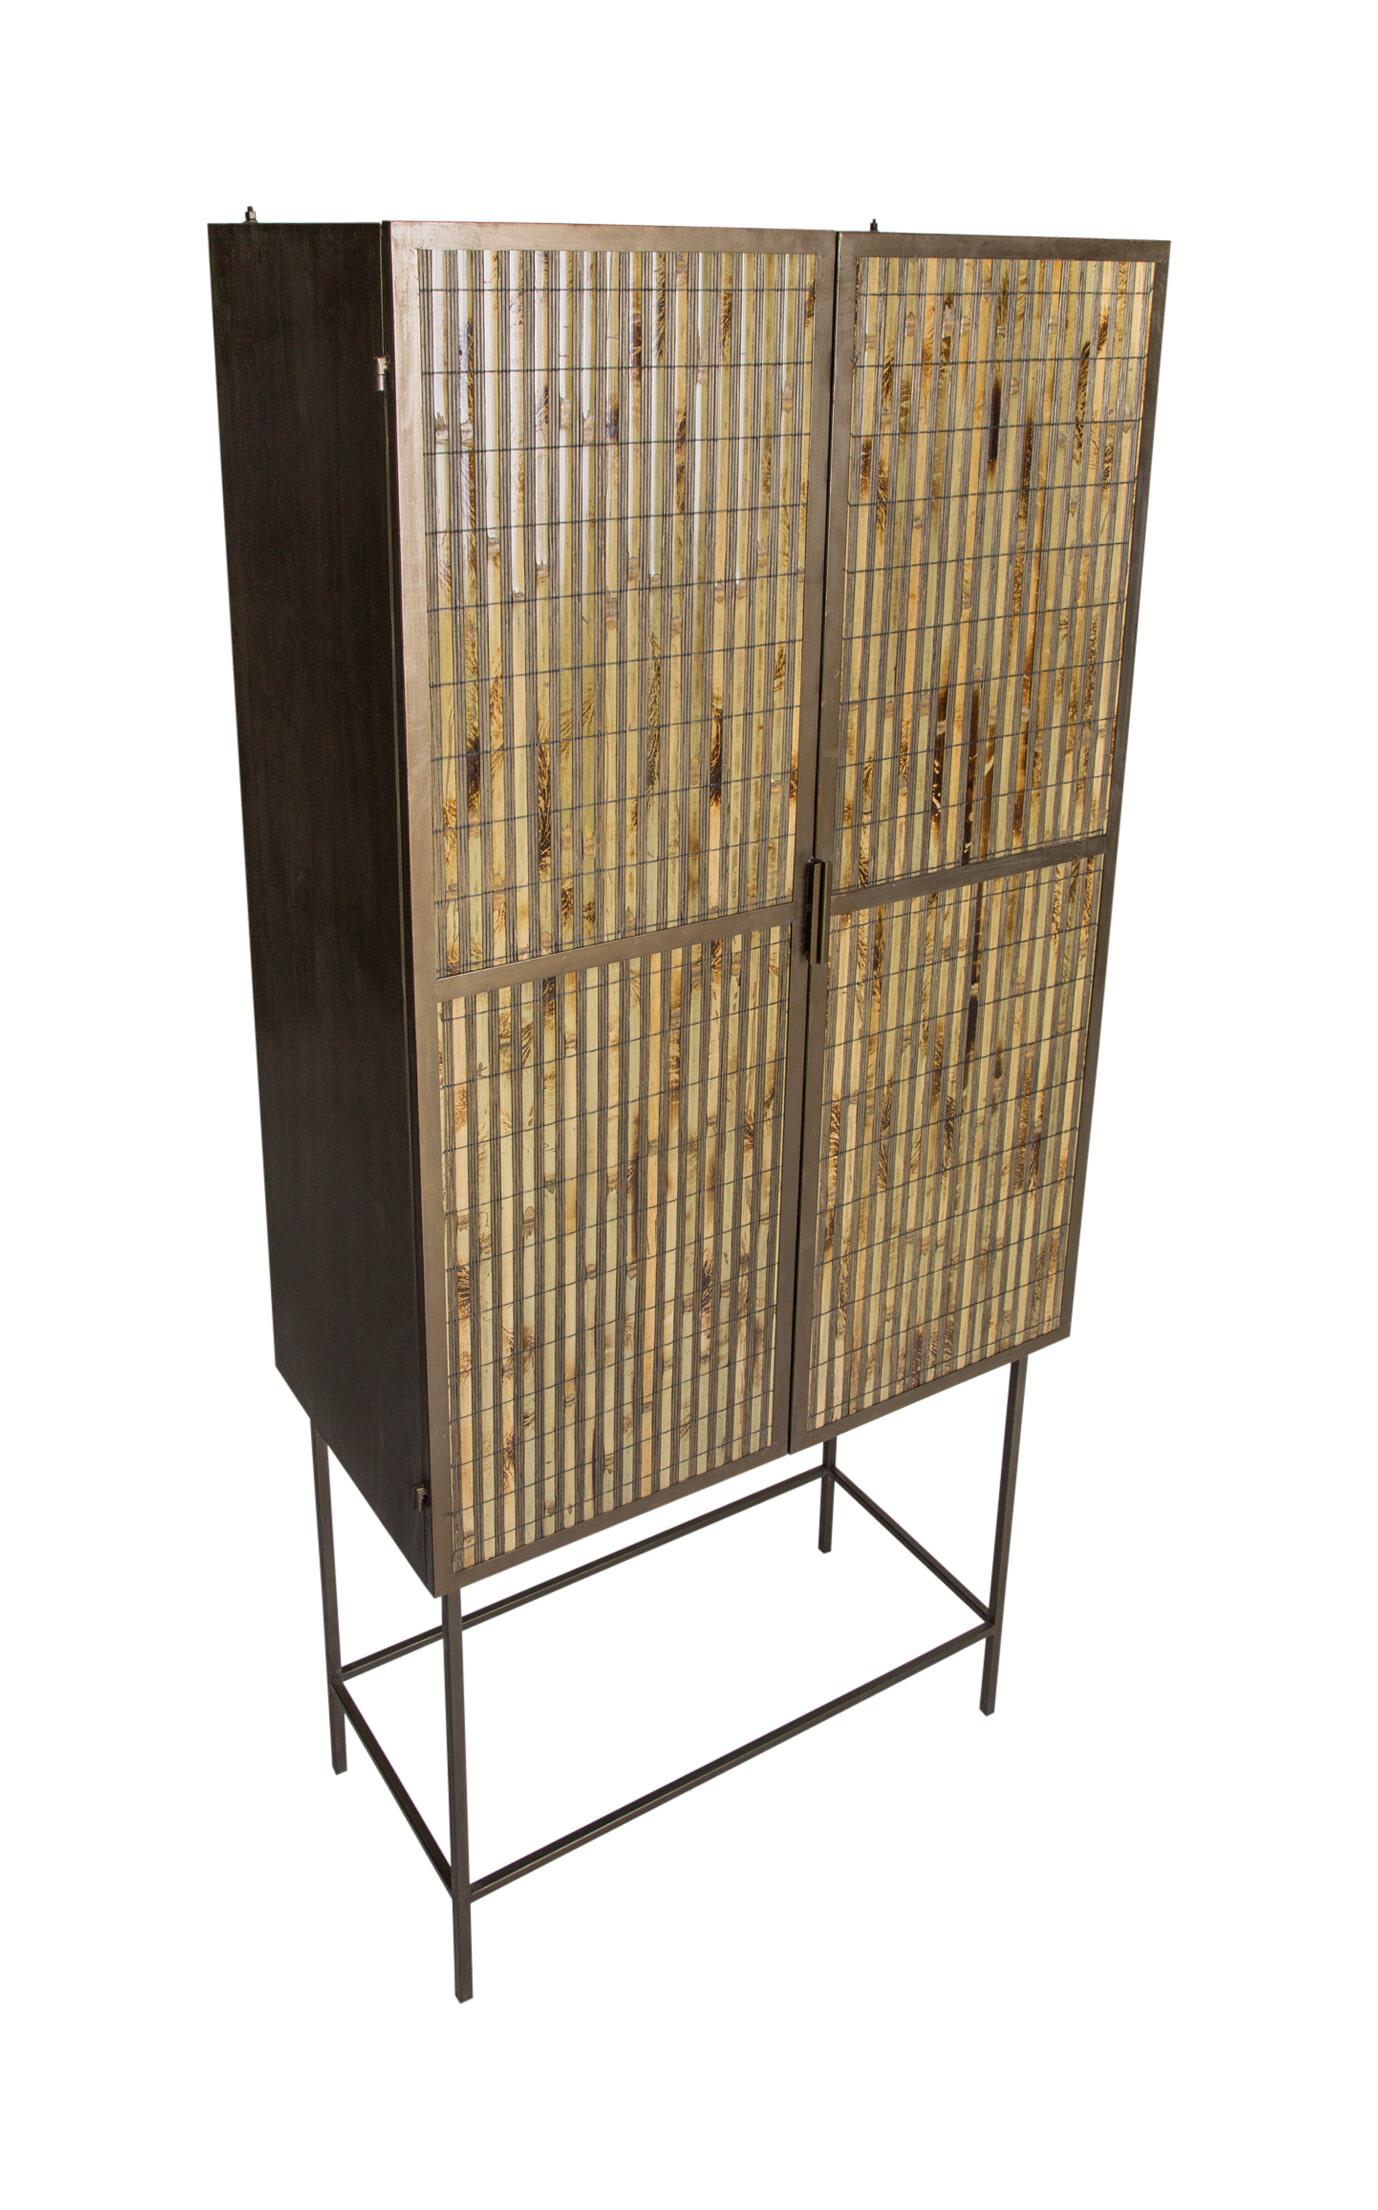 PTMD Opbergkast 'Metal', Bamboe, 178 x 43.5 x 81.5cm, kleur Bruin